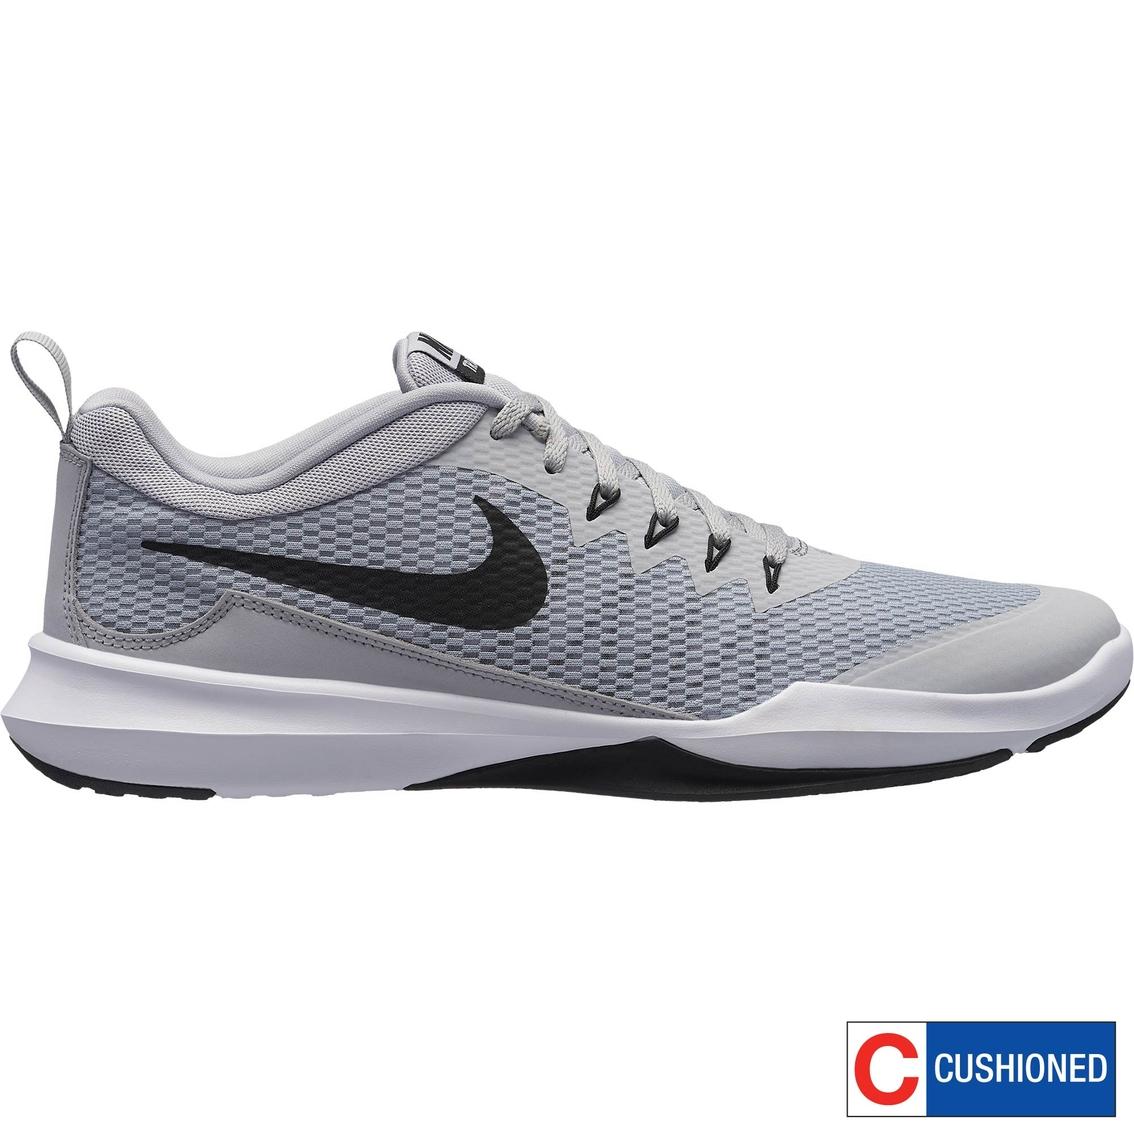 Nike Men's Legend Trainer Shoes | Cross